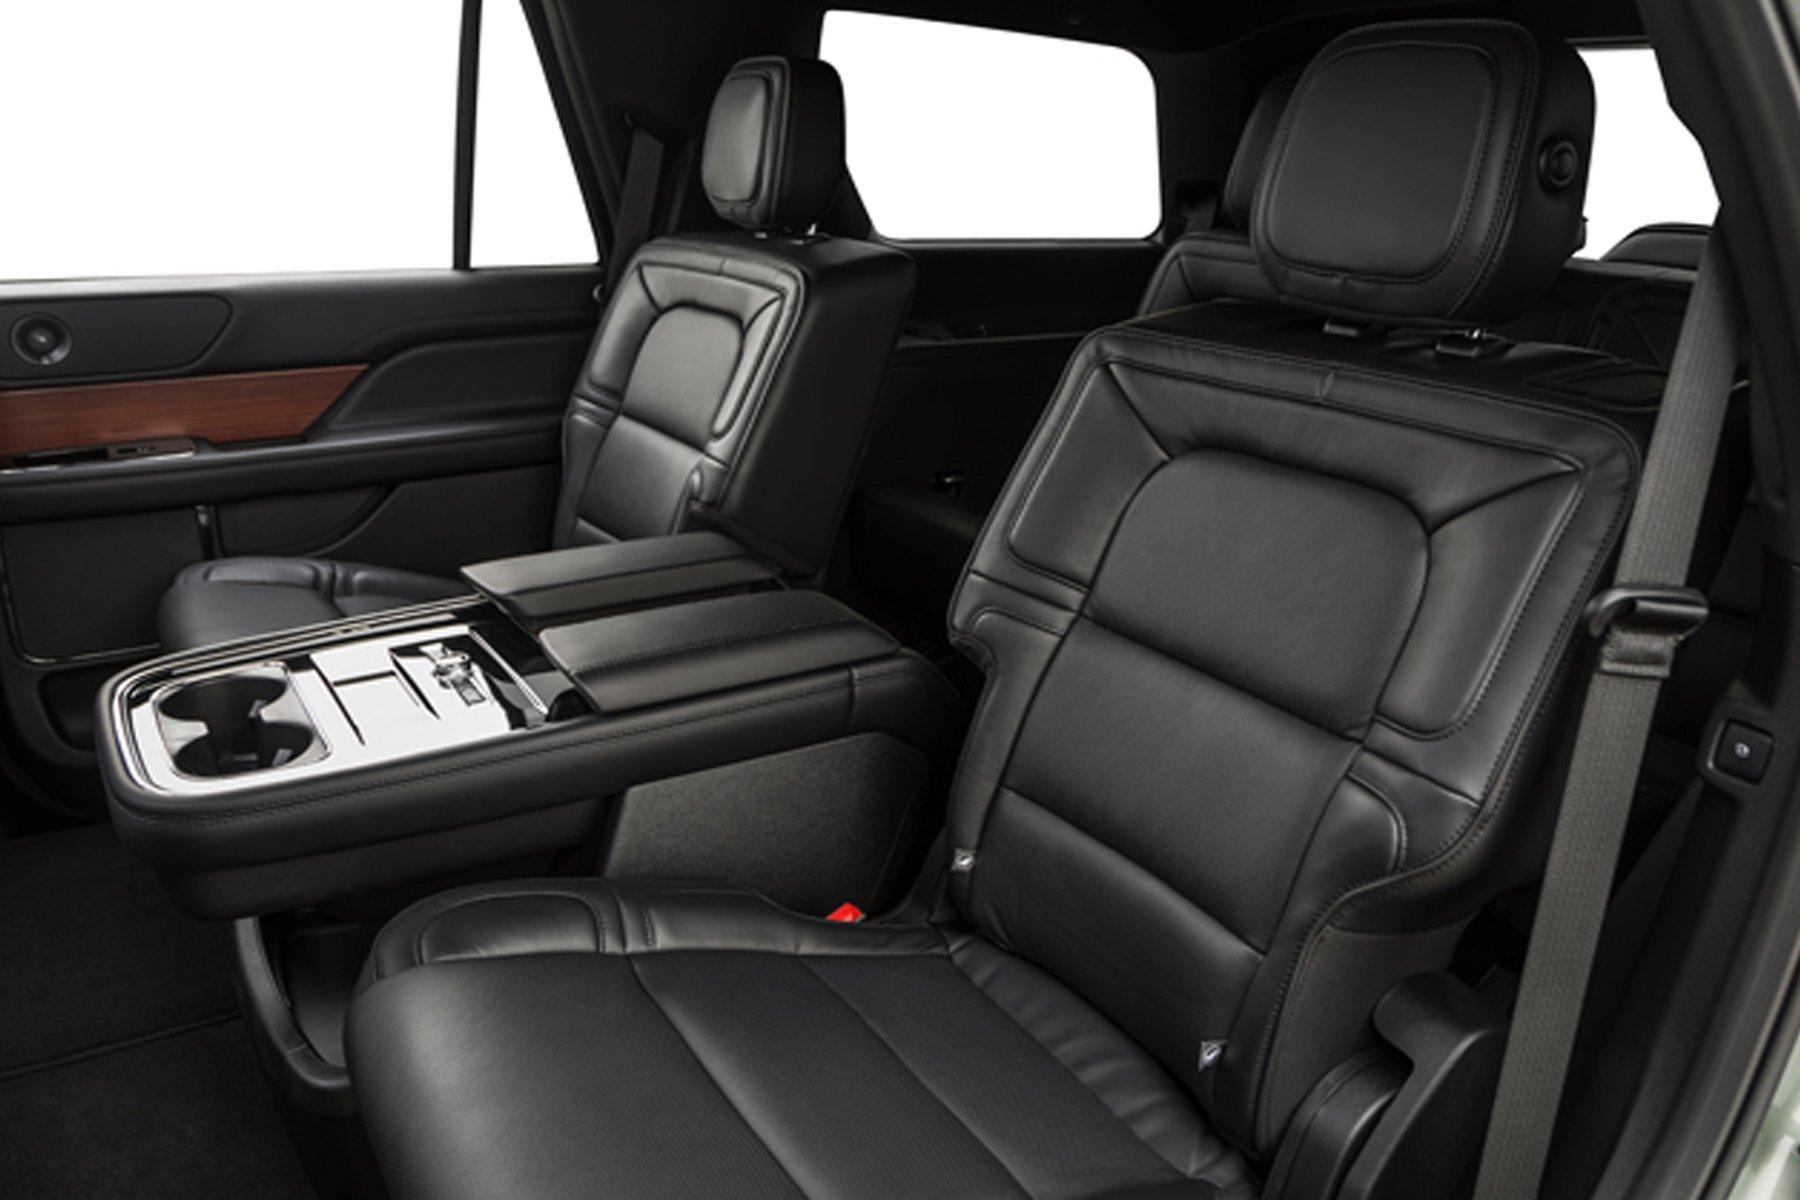 Skyline Chicago Limo Cars Luxury Fleet Black Lincoln Navigator Interior Back Seat October 2020